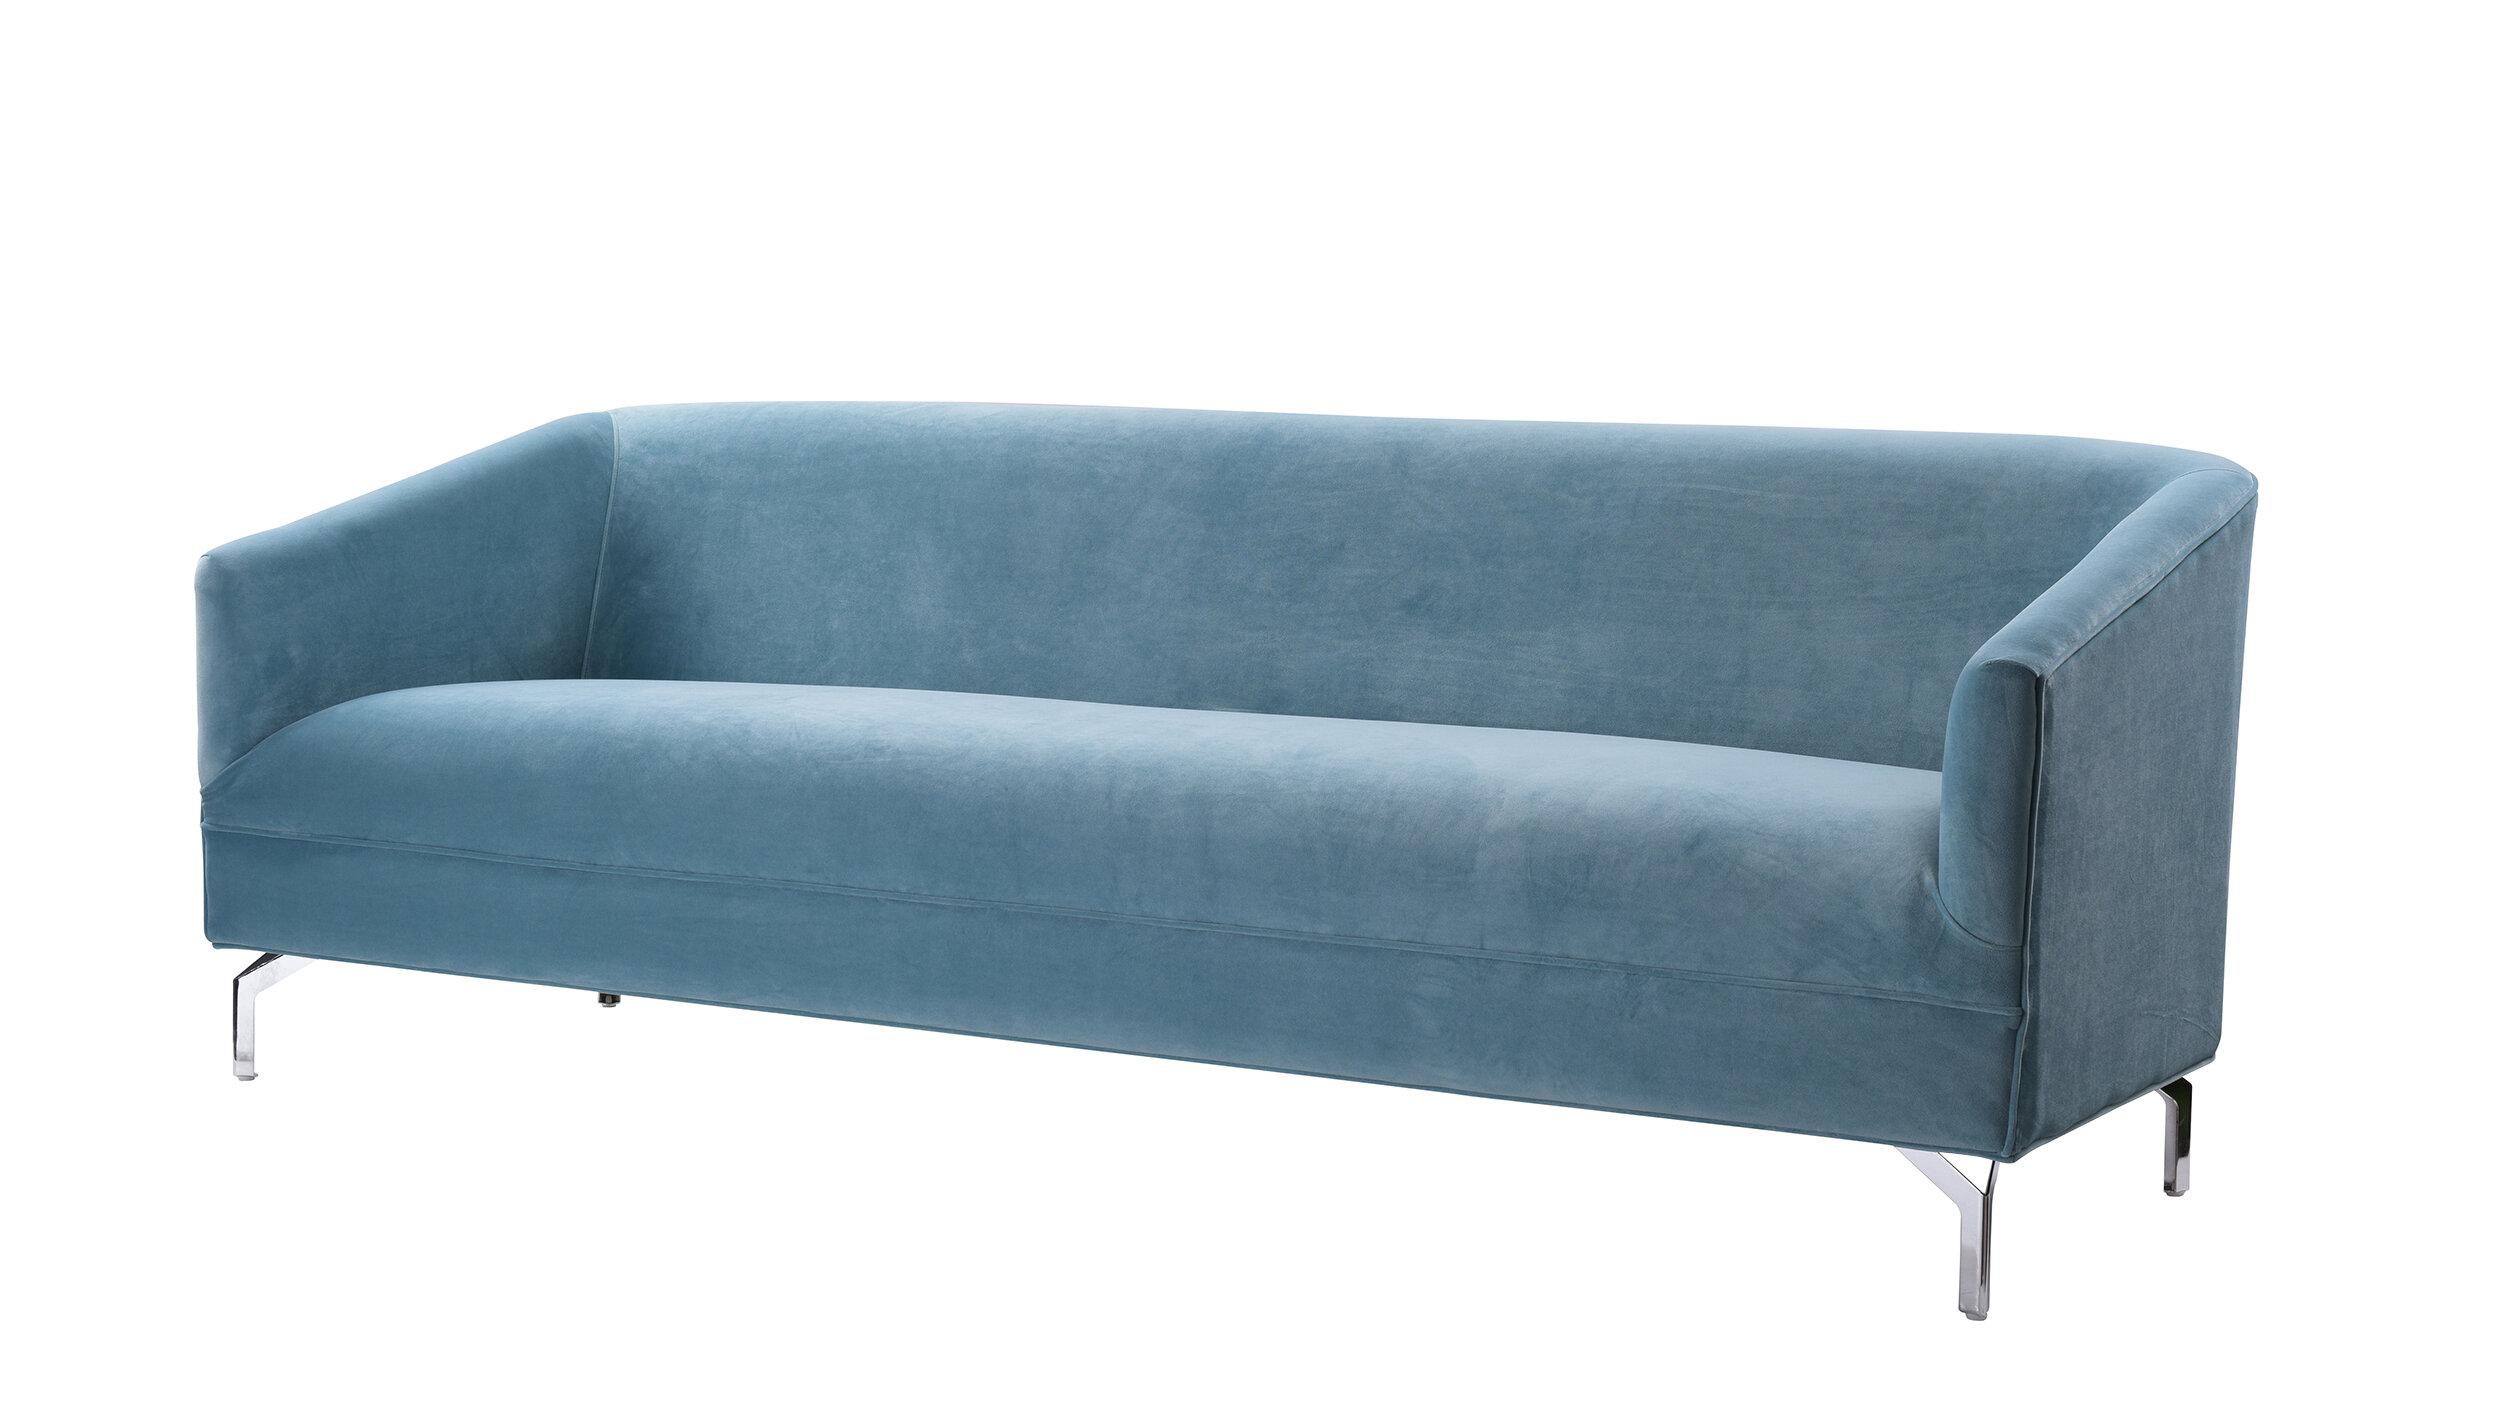 Cass tight back sofa reviews allmodern